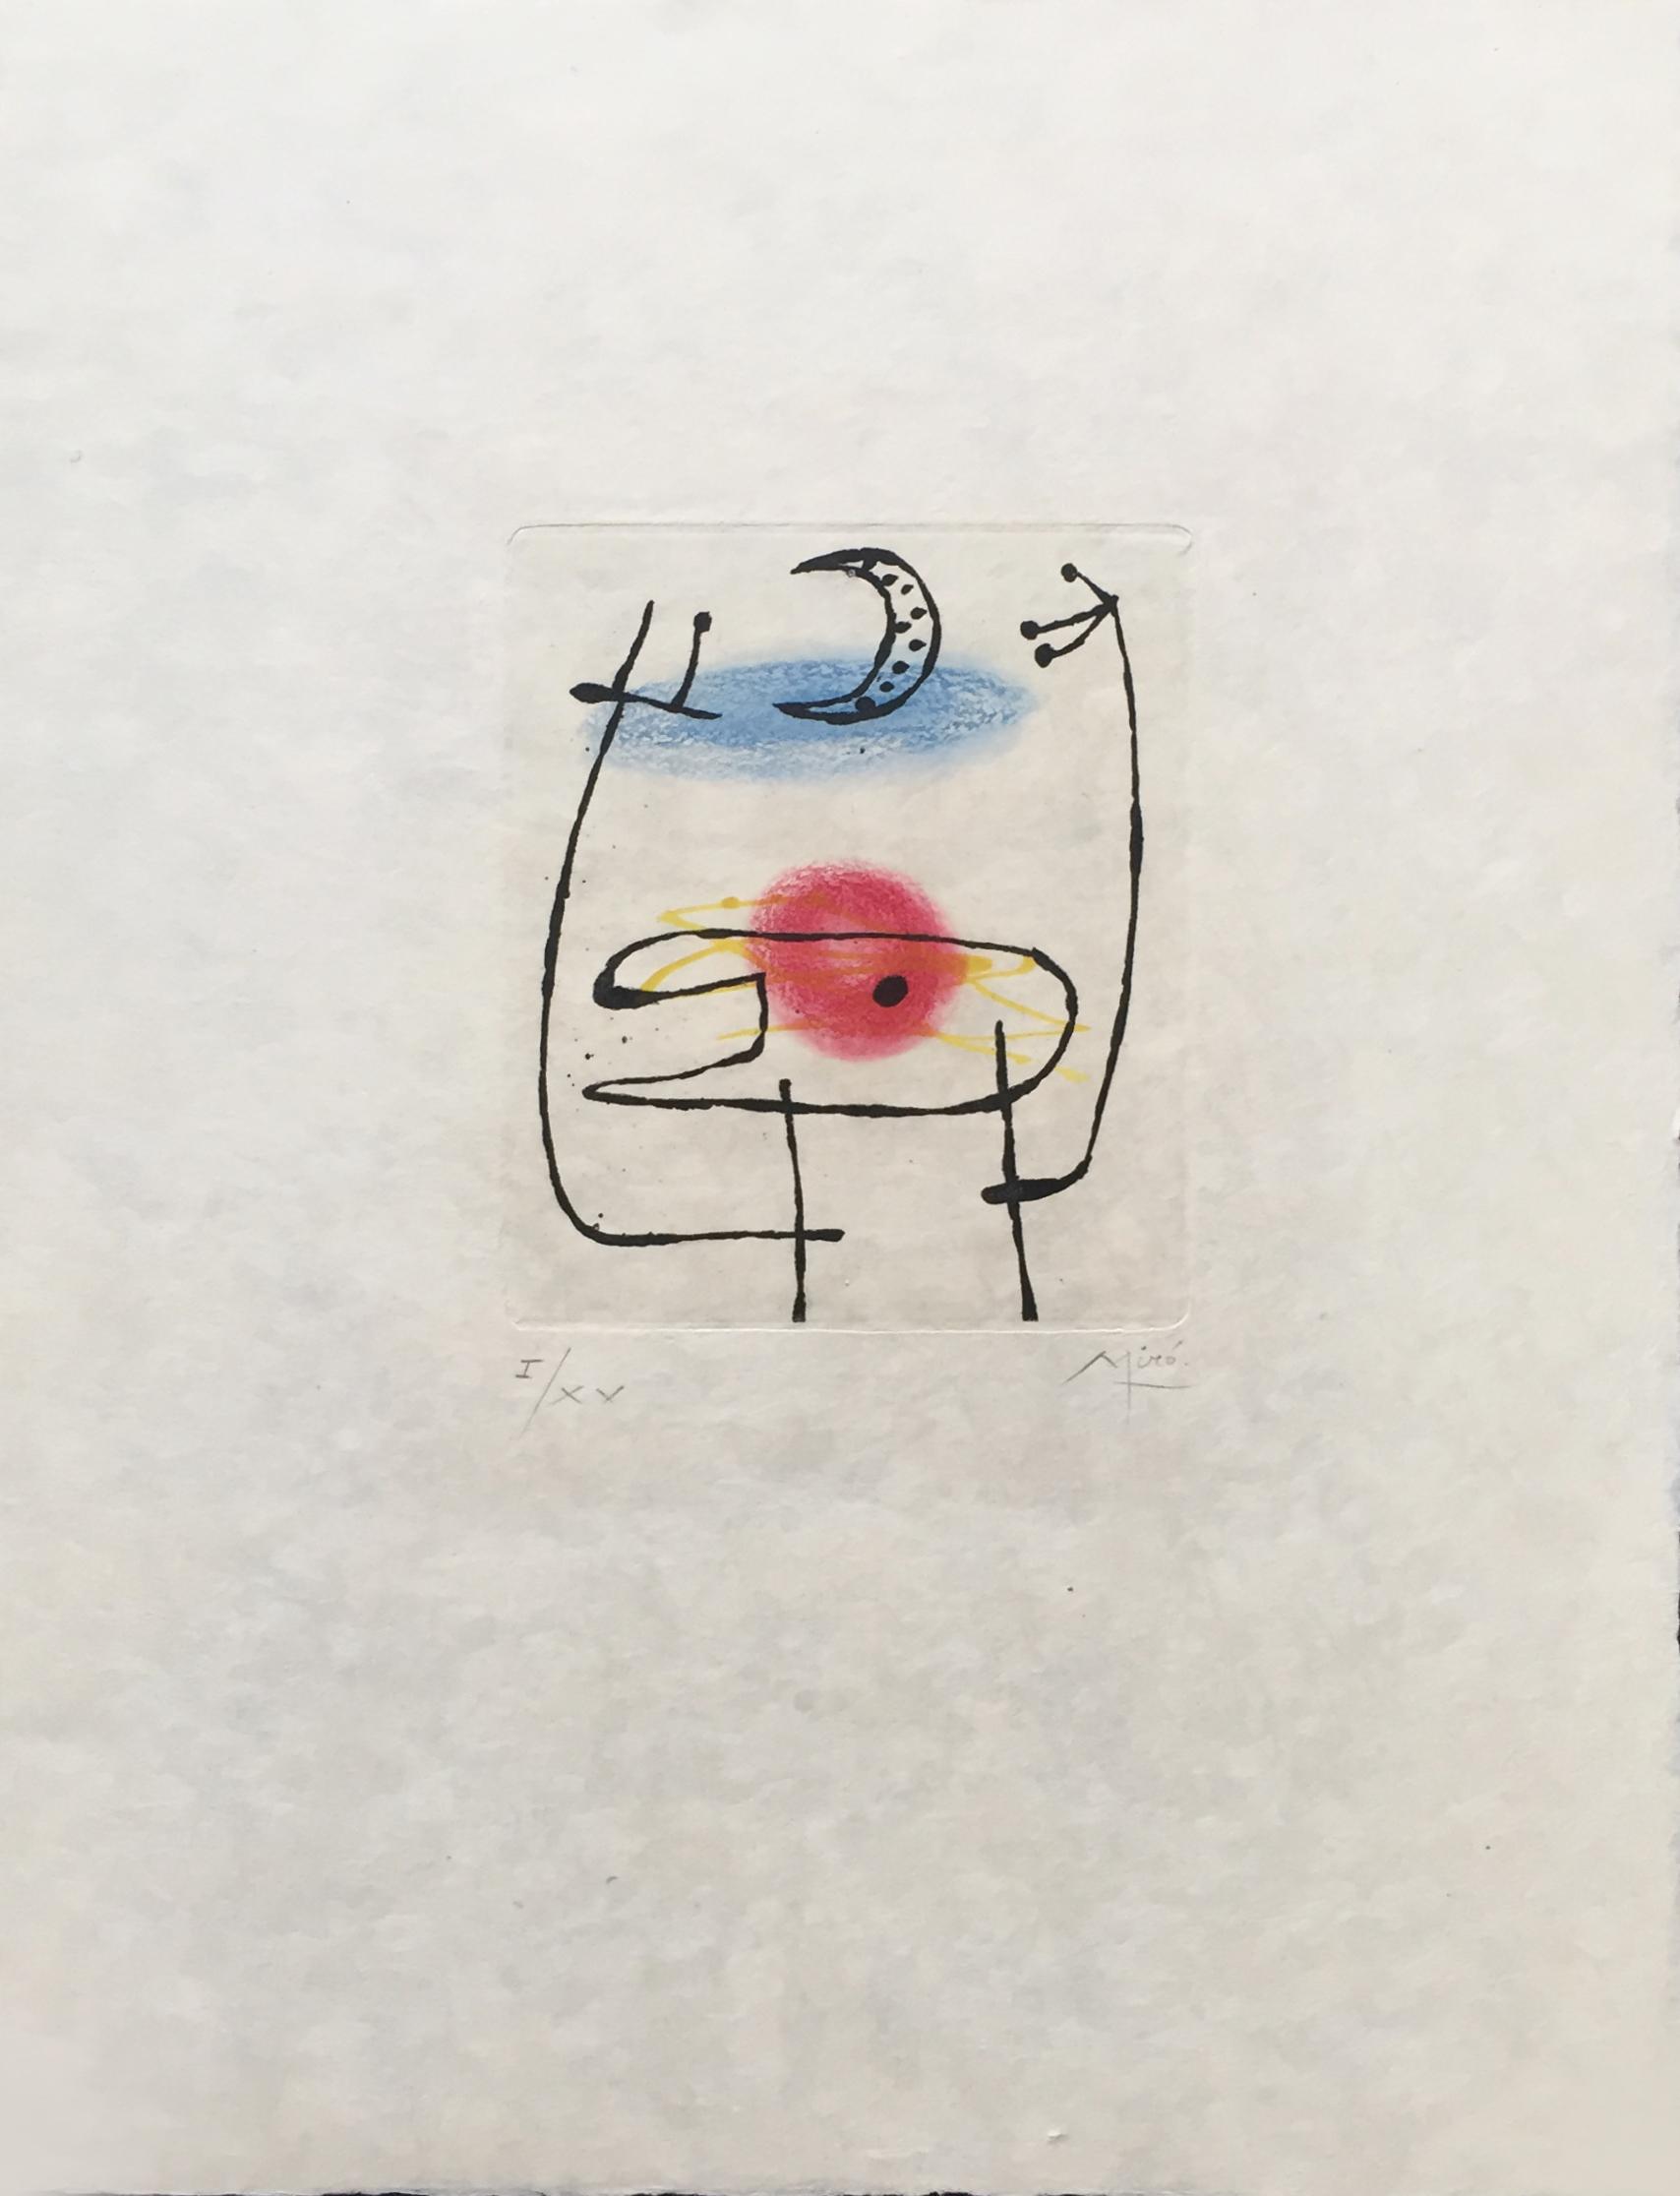 La Bague D'aurore by Joan Miro